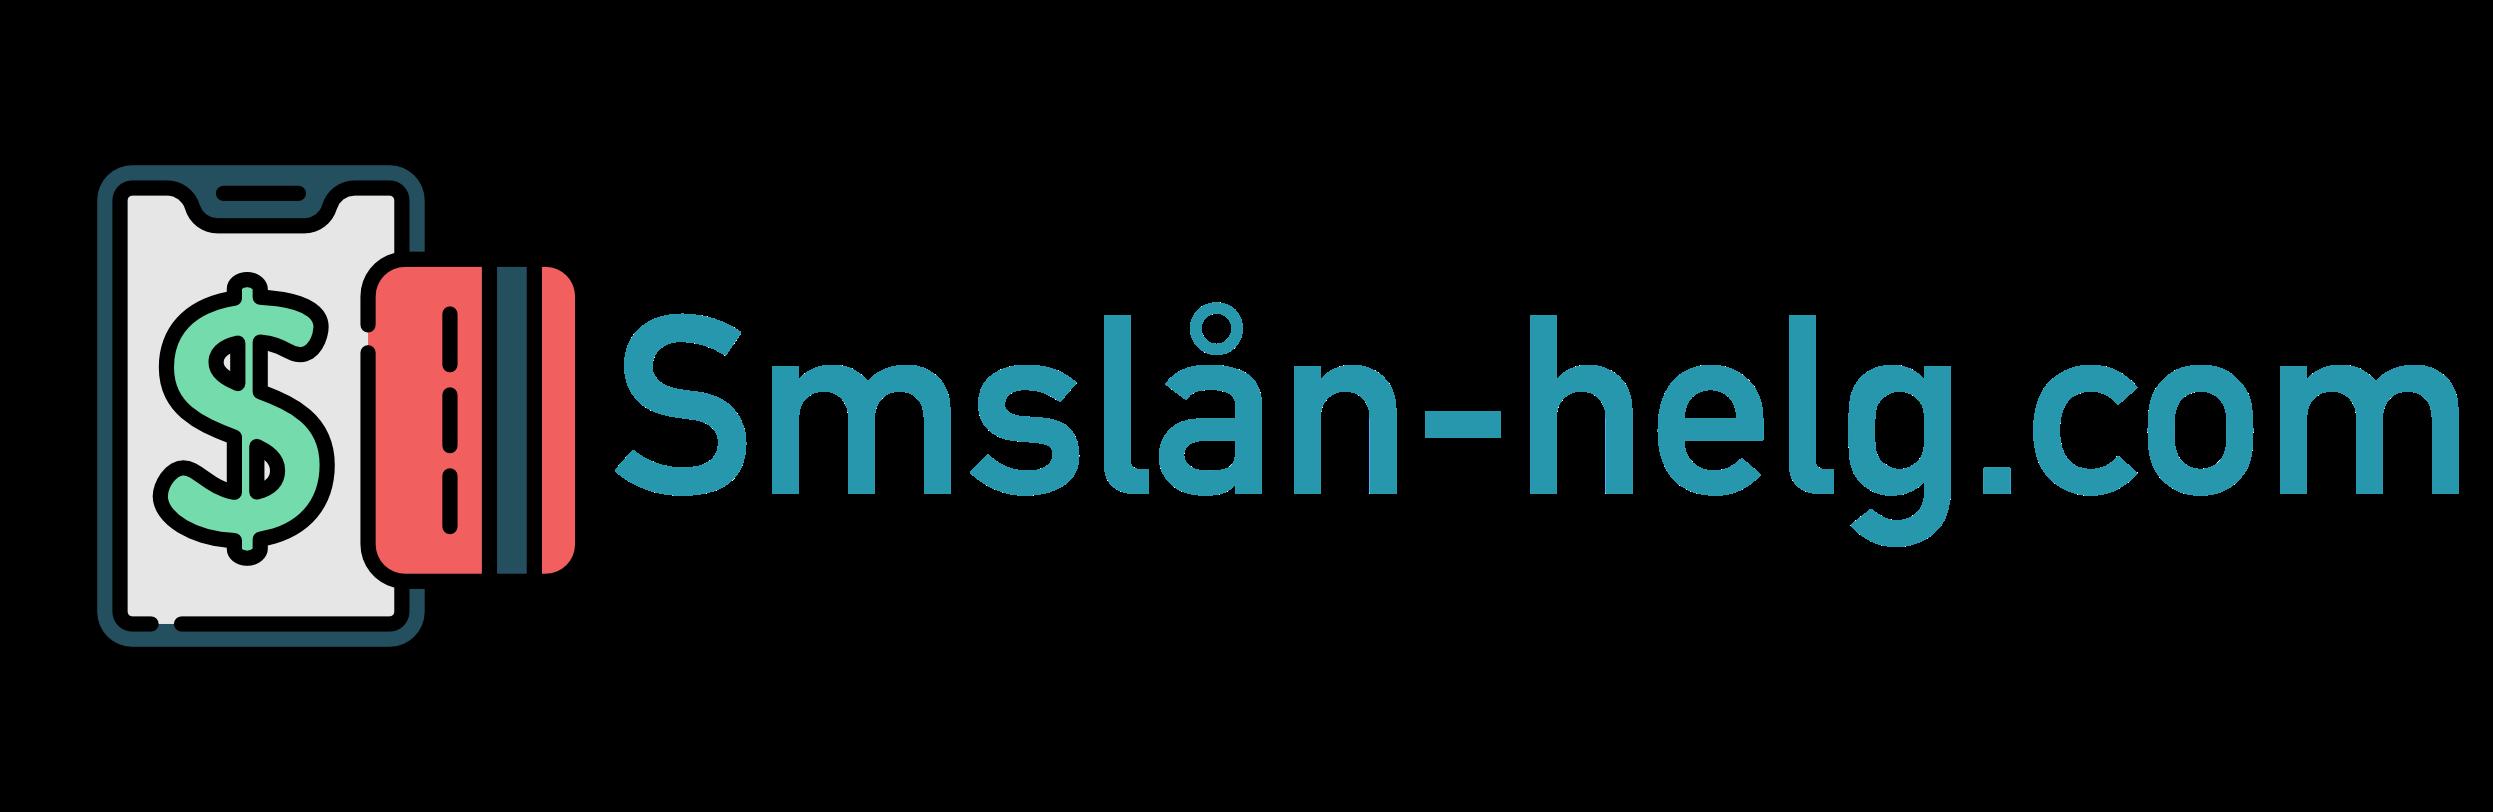 Smslån-helg.com